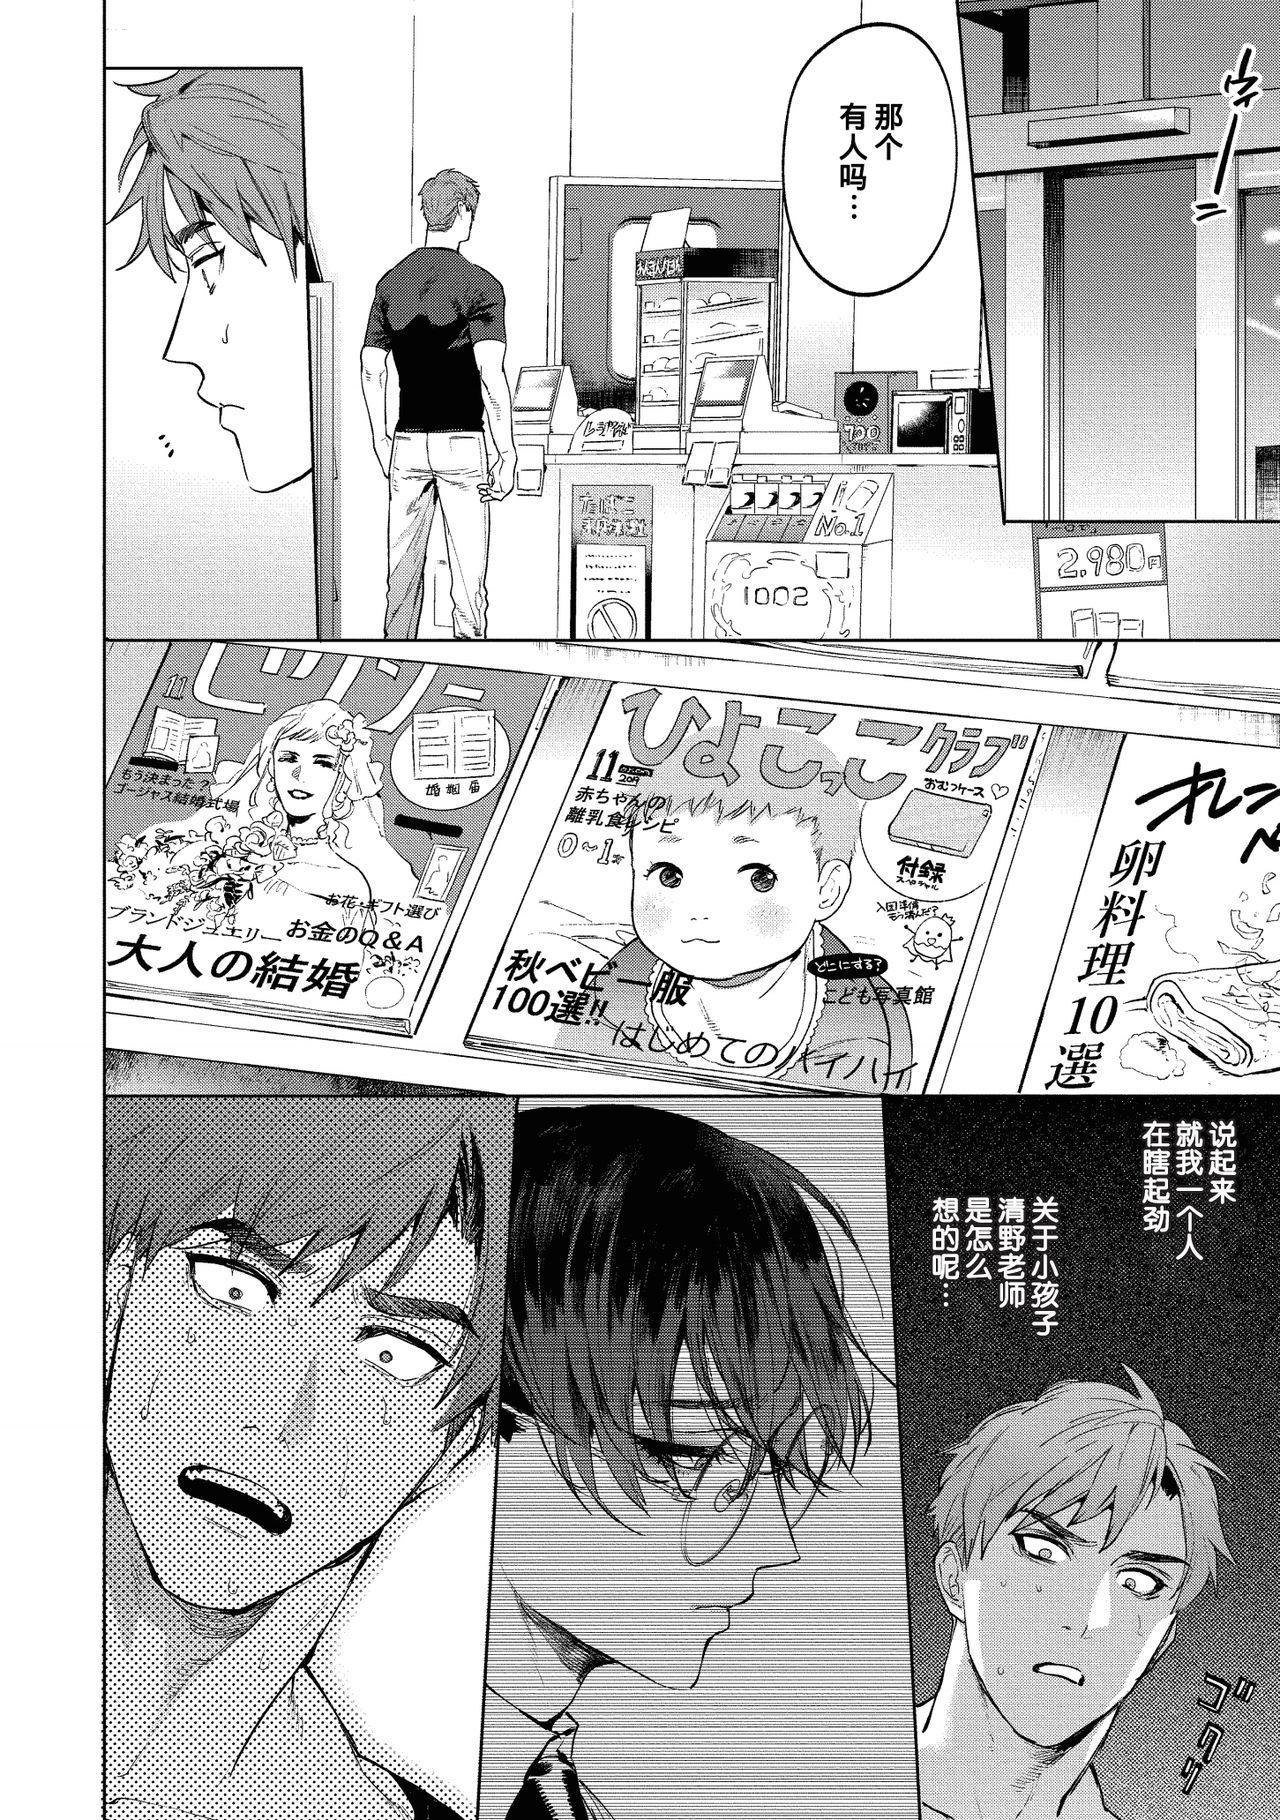 Sensei wa Benki ja Arimasen.3 | 老师不是便器。3 17